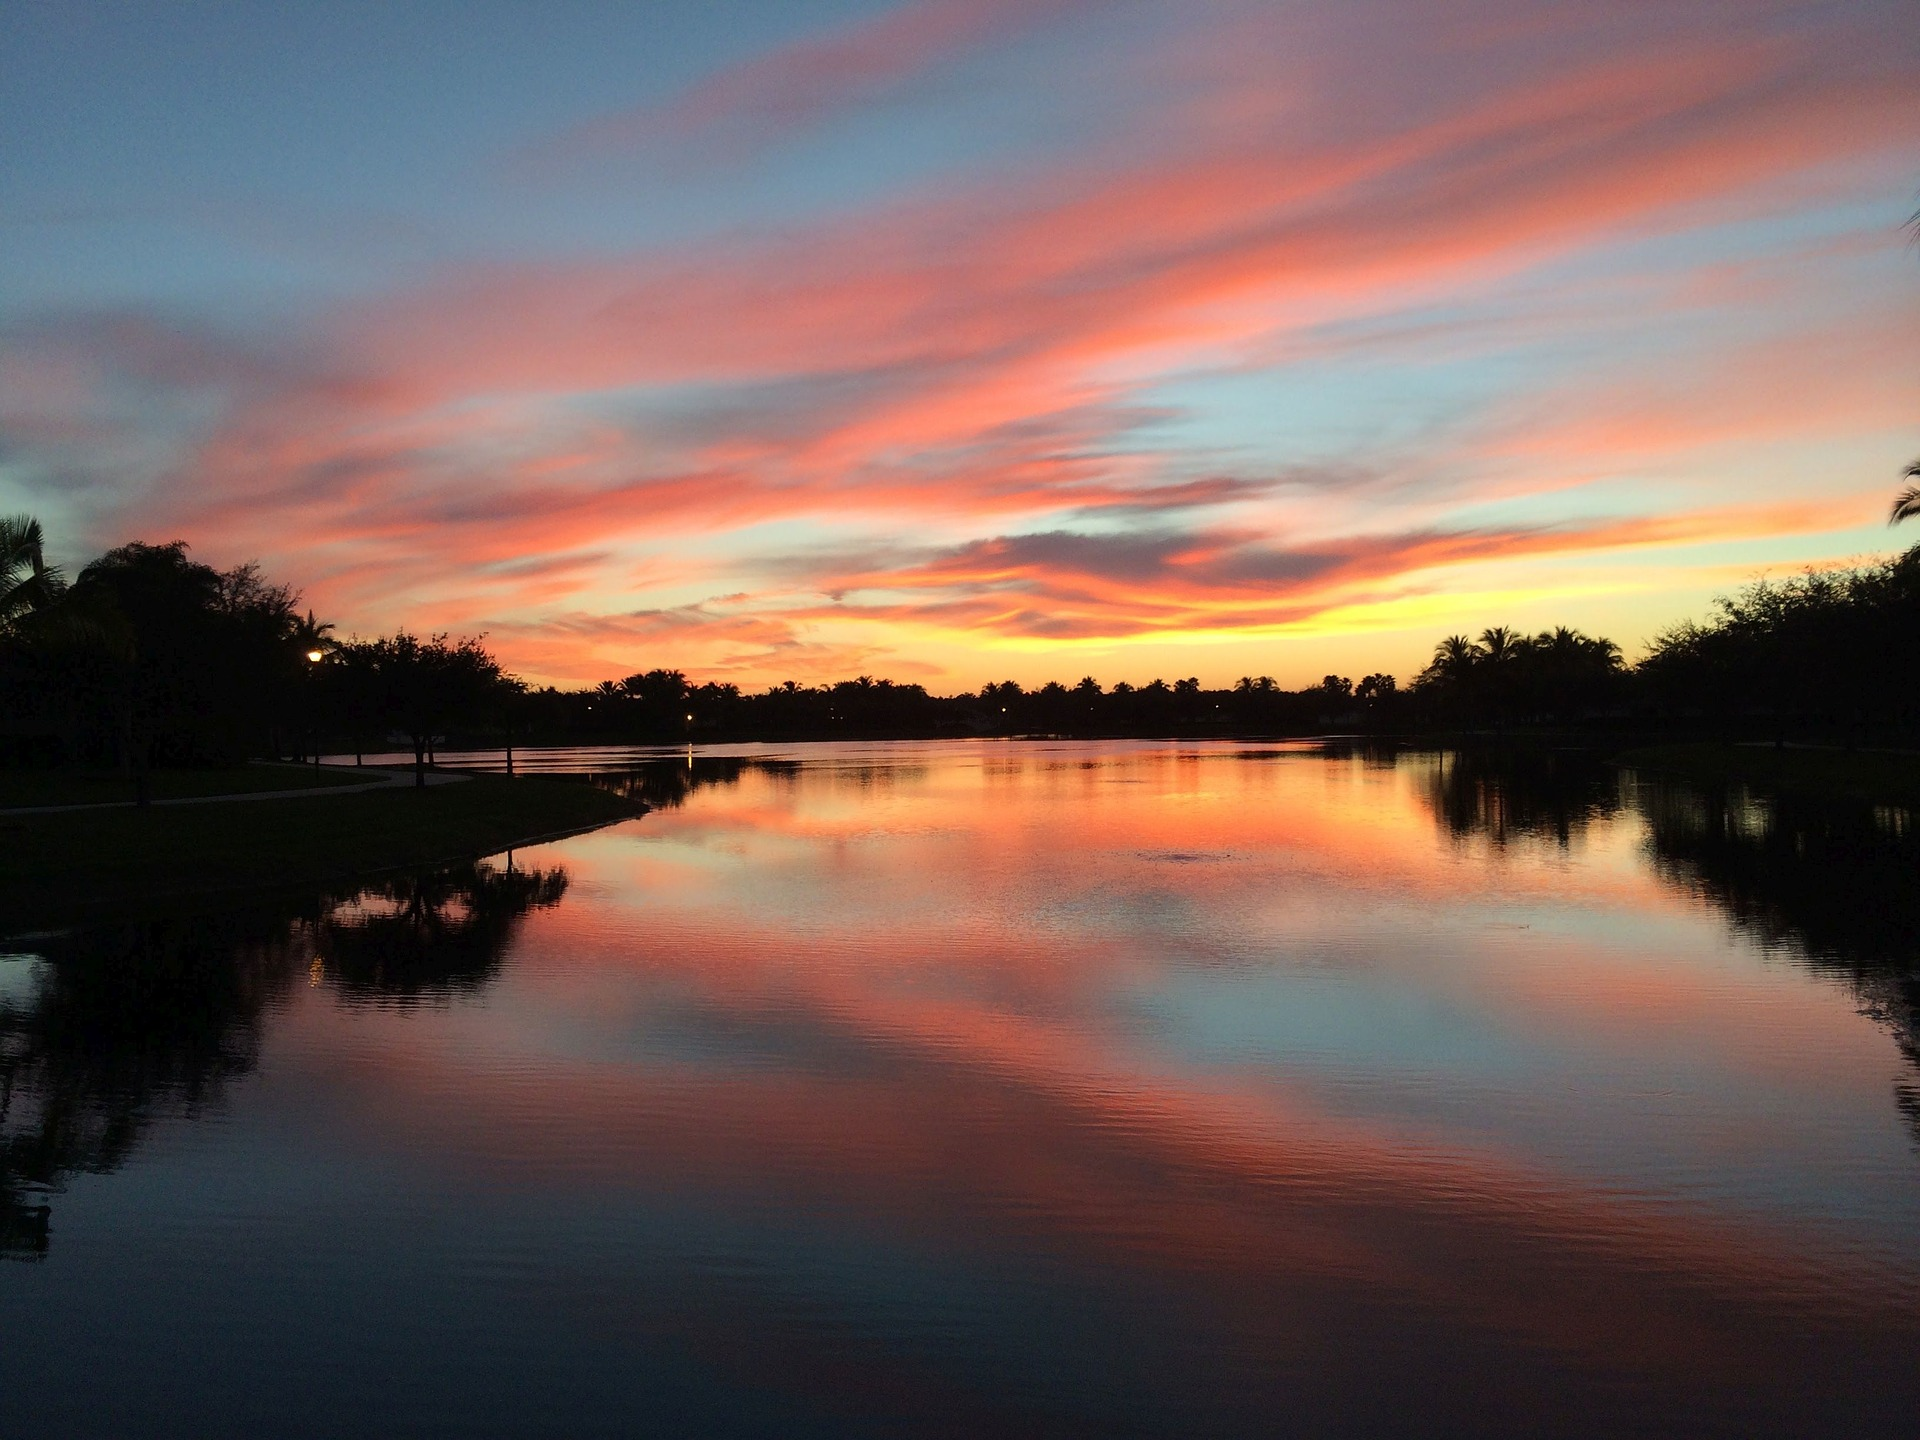 sunset 3.jpg